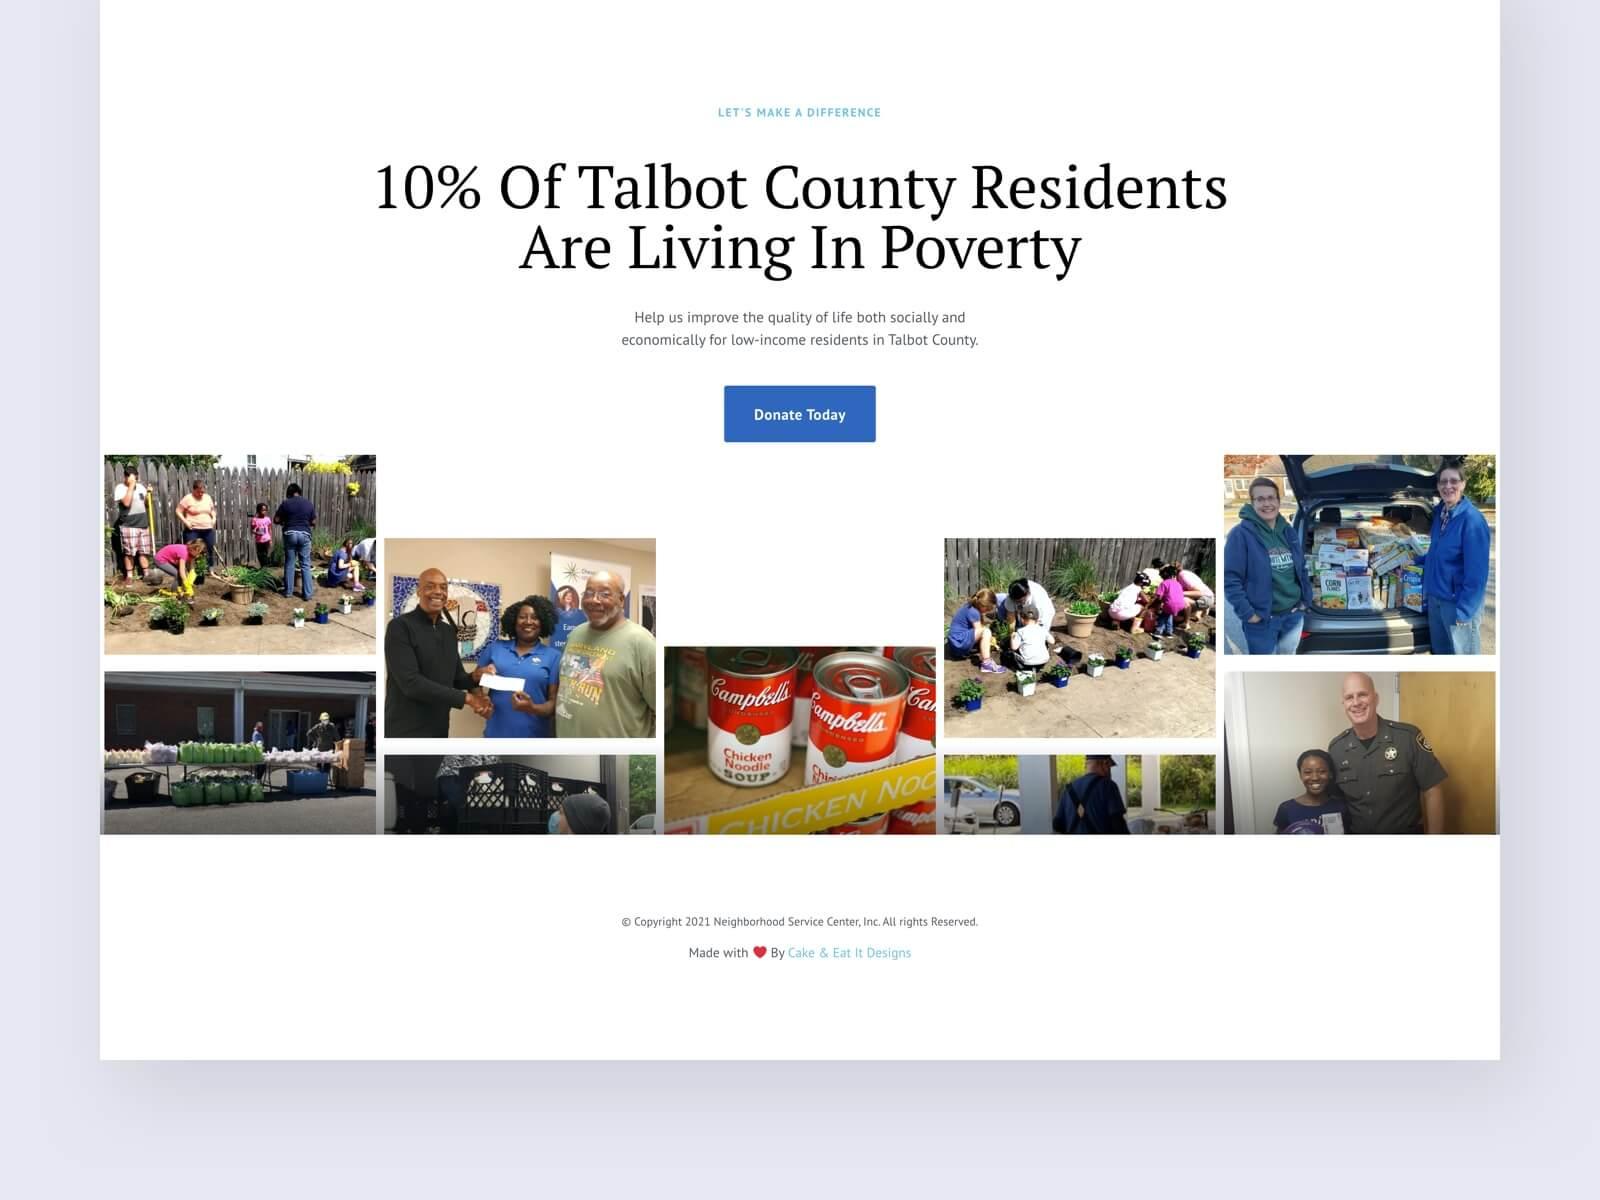 neighborhood-service-center-call-to-action@2x